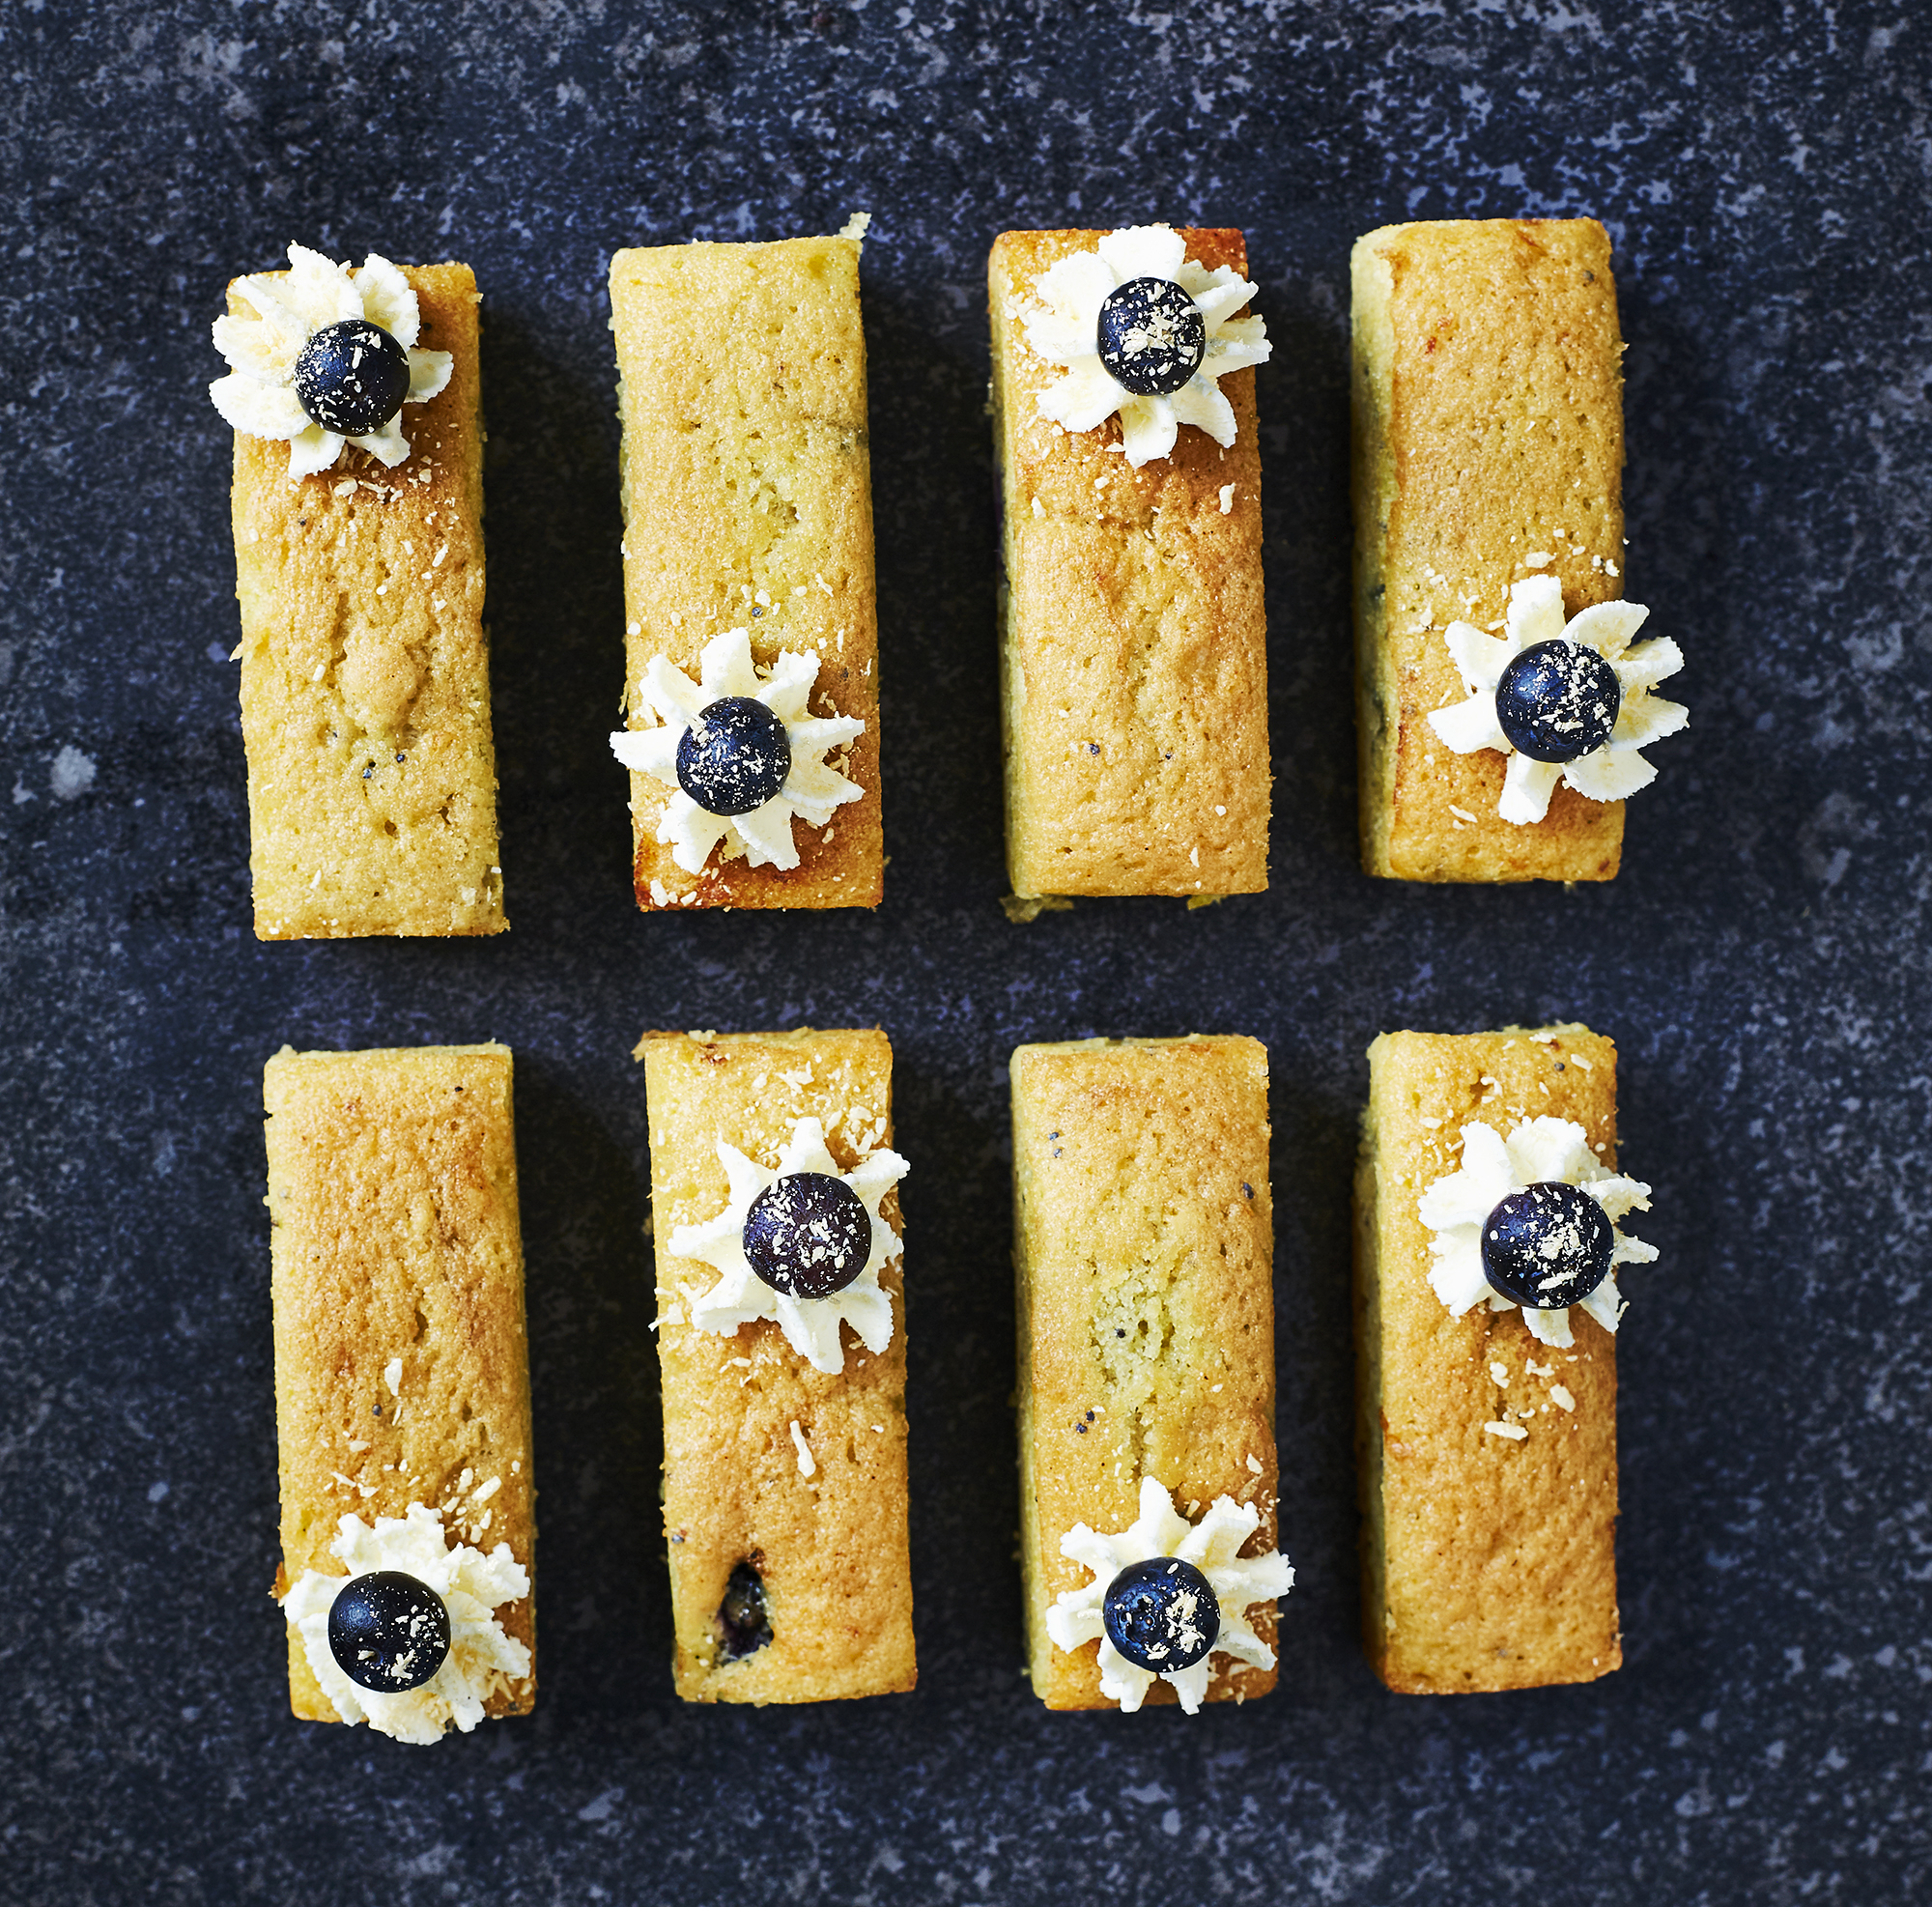 Gluten Free Lemon, Blueberry & Poppyseed Mini Loaf